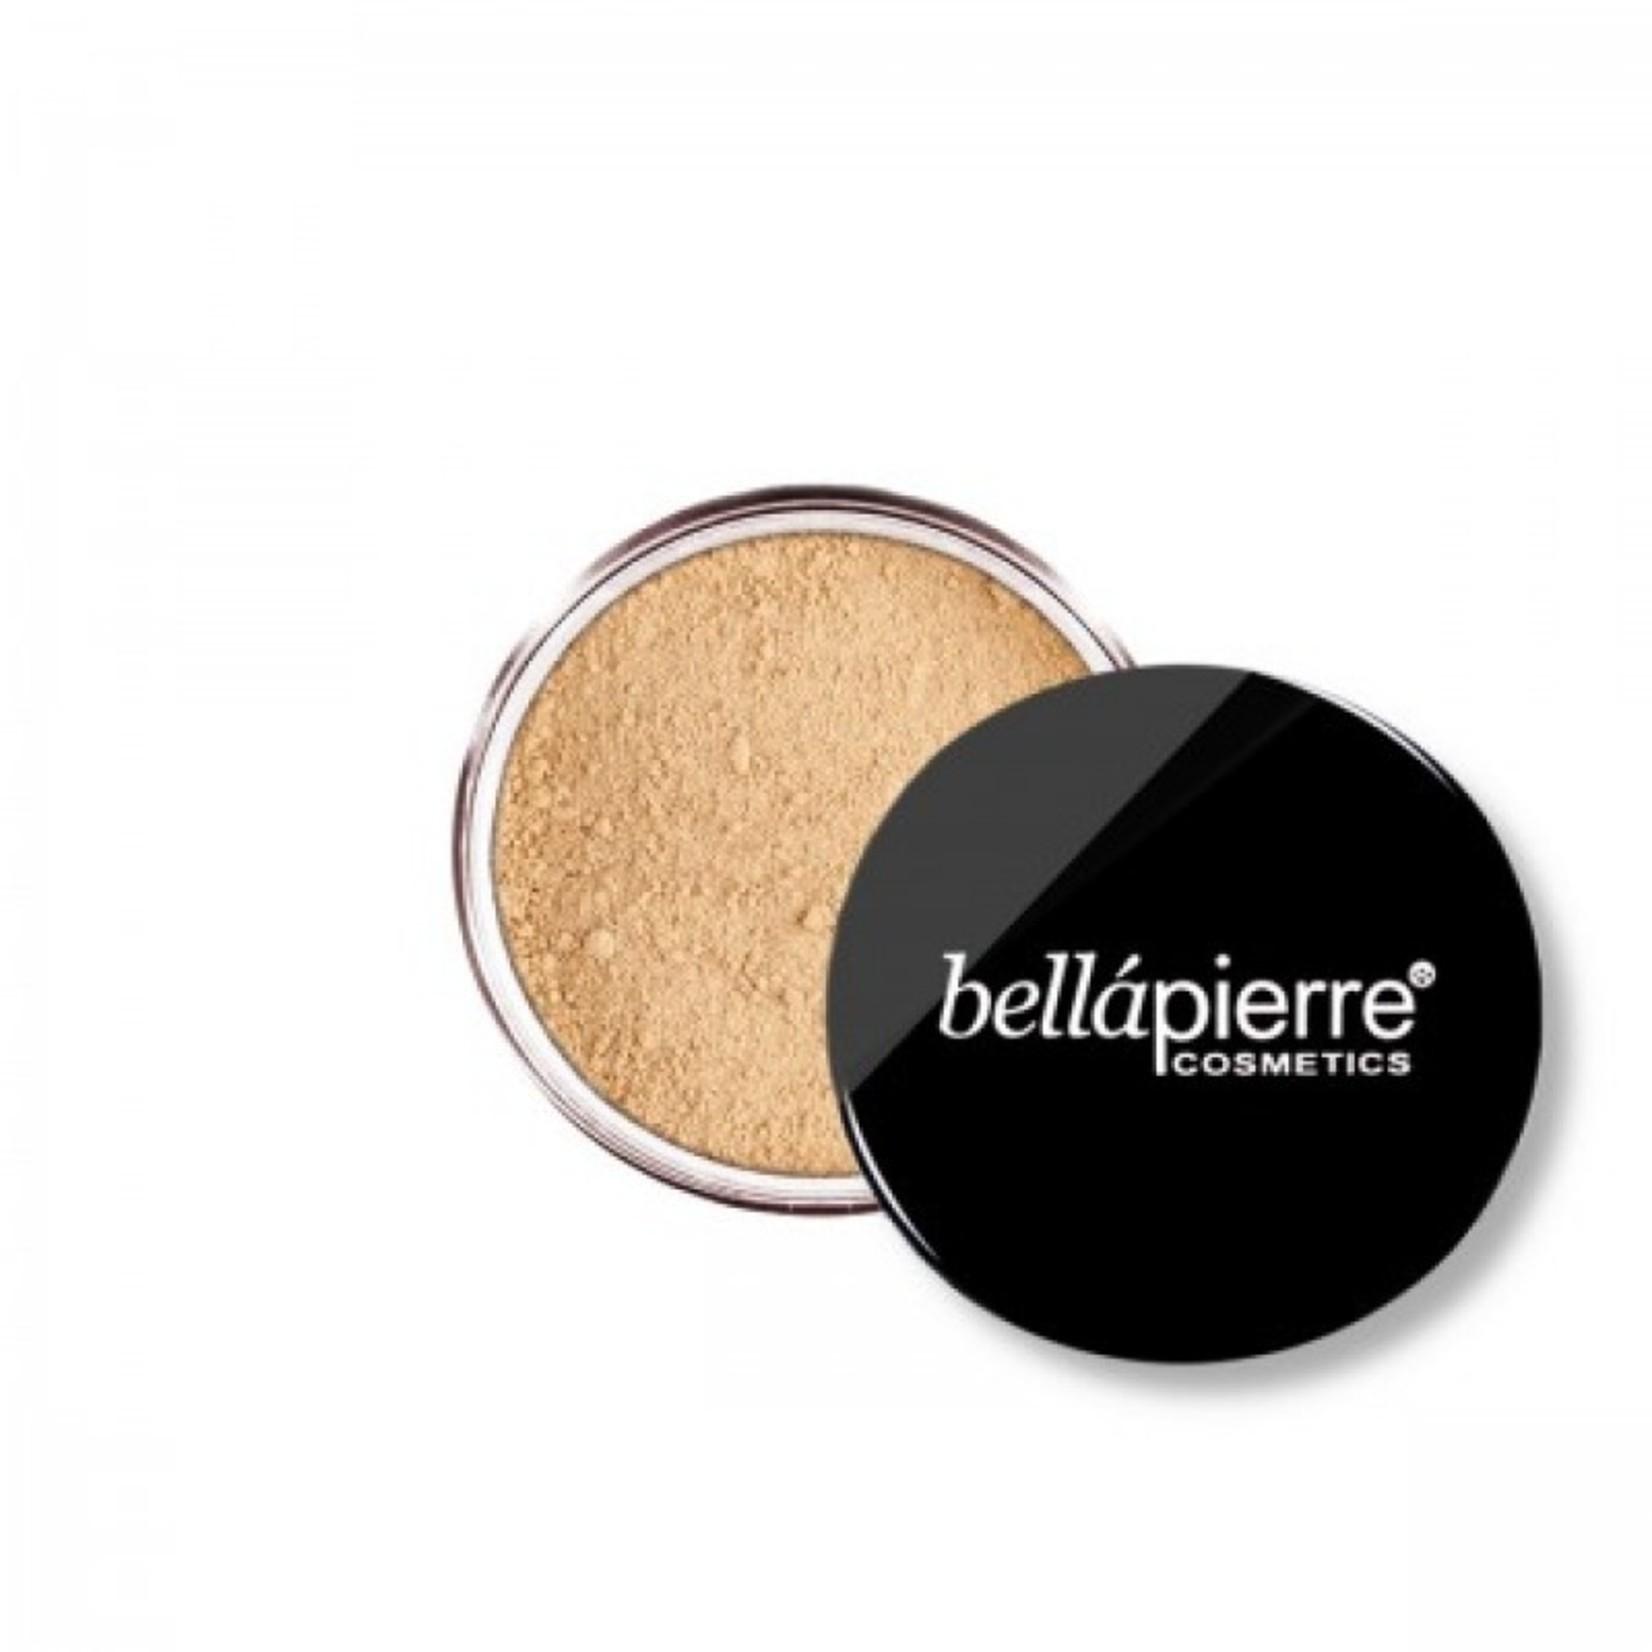 Bellapierre Mineral loose - foundation - Nutmeg